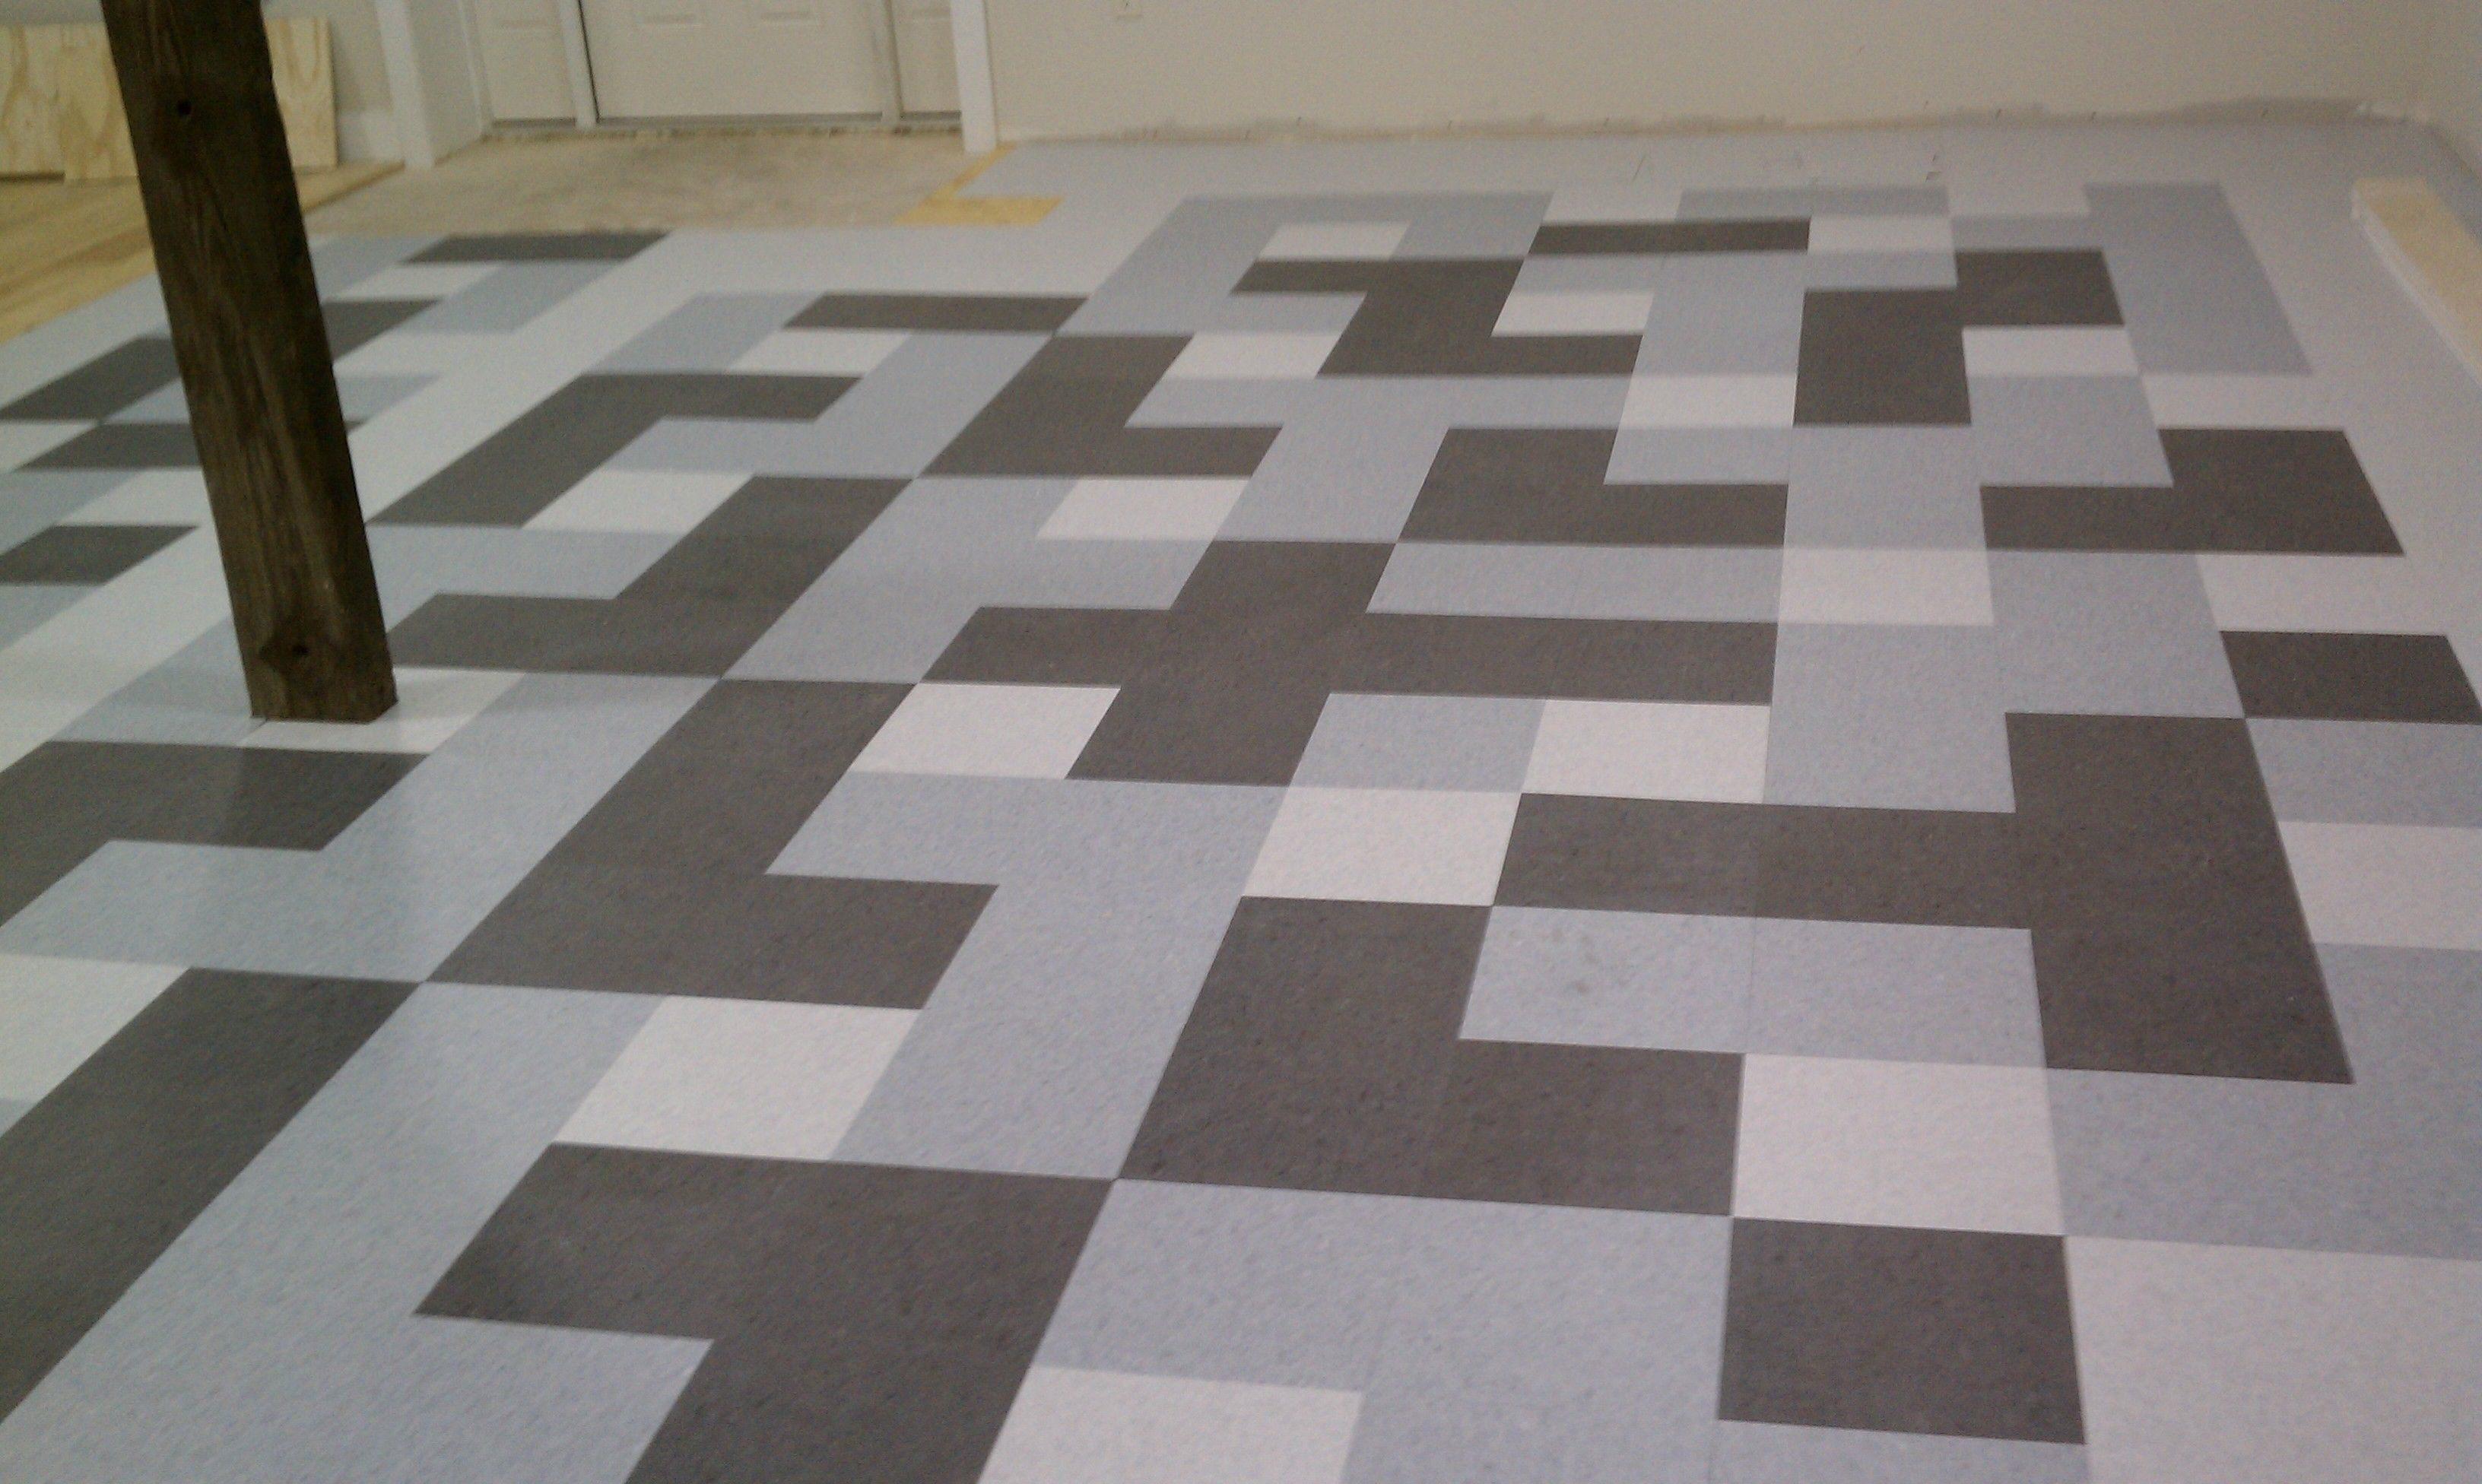 diy painting concrete floors